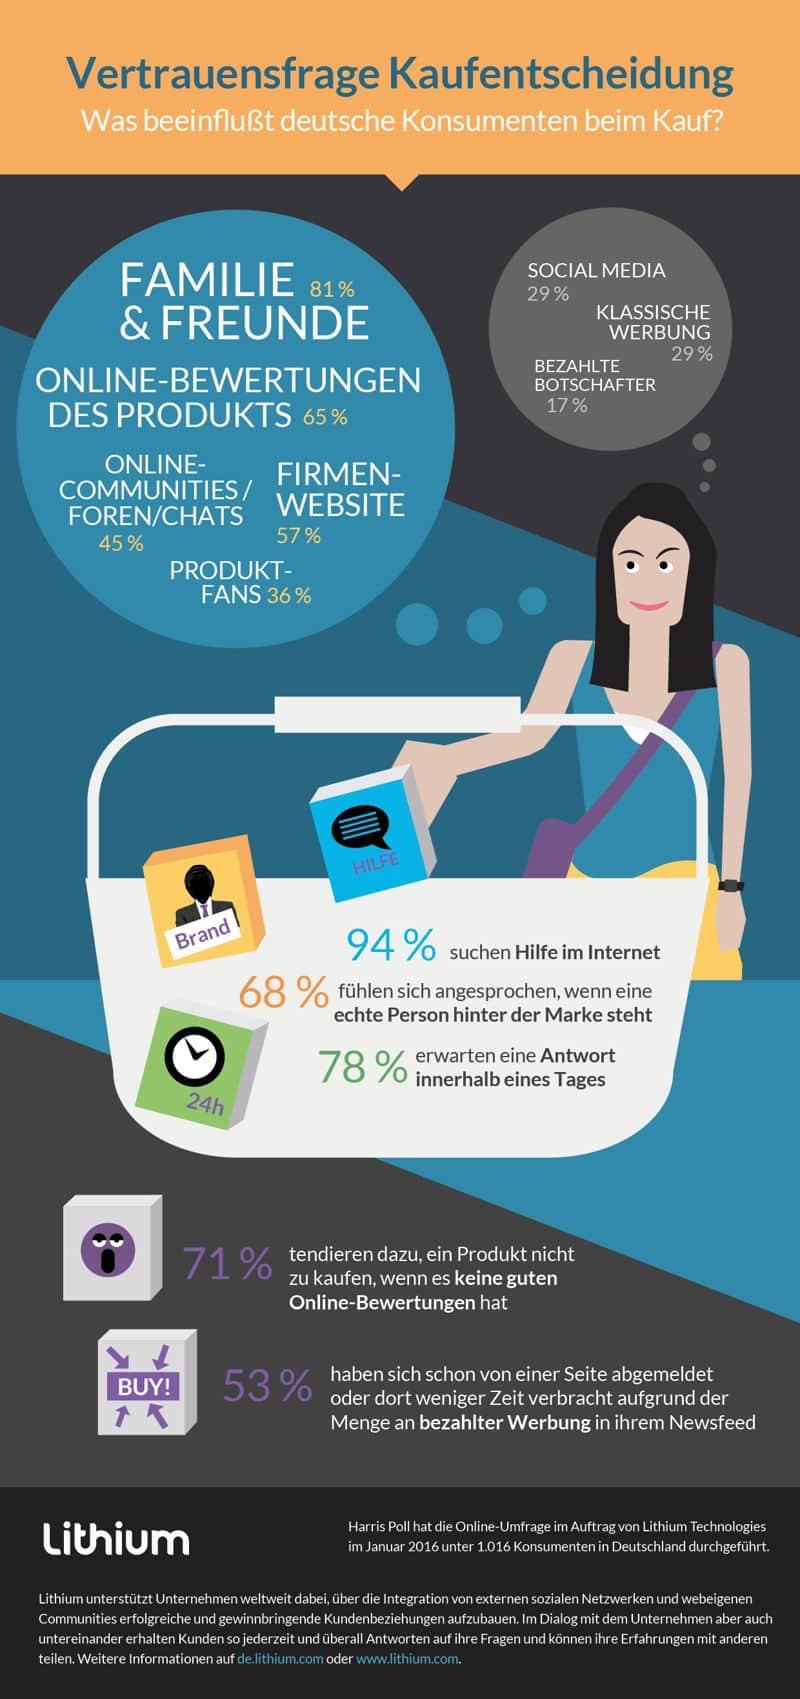 bildung-kaufentscheidung-konsumenten-infografik